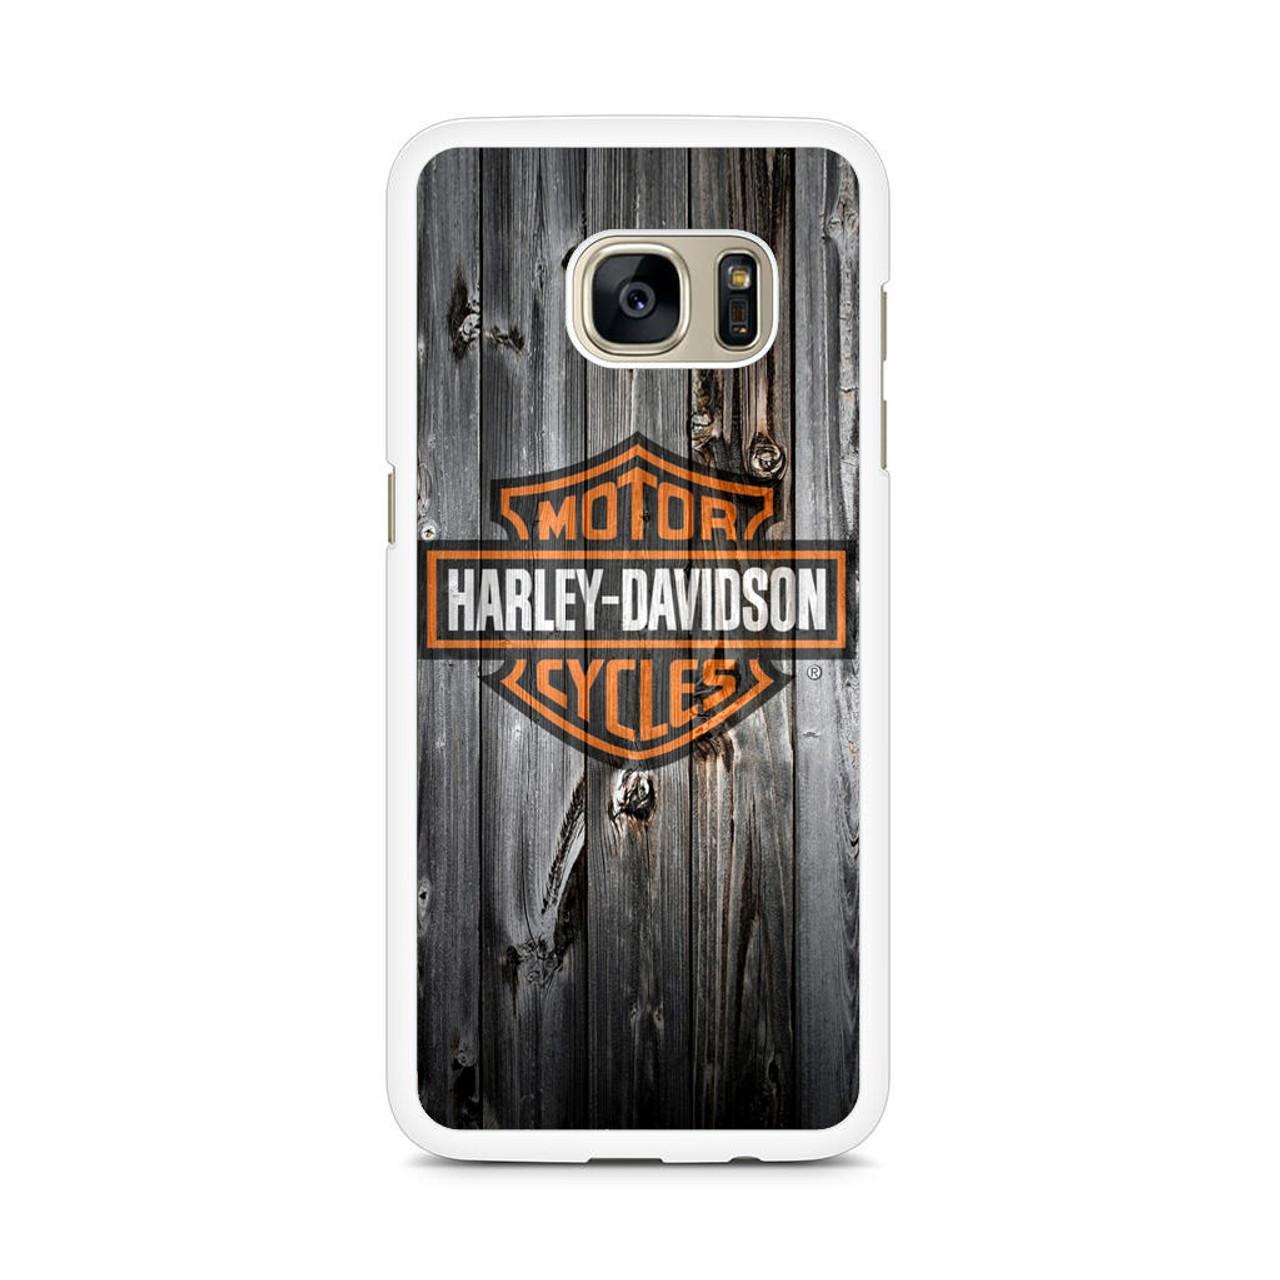 cover samsung s7 edge harley davidson